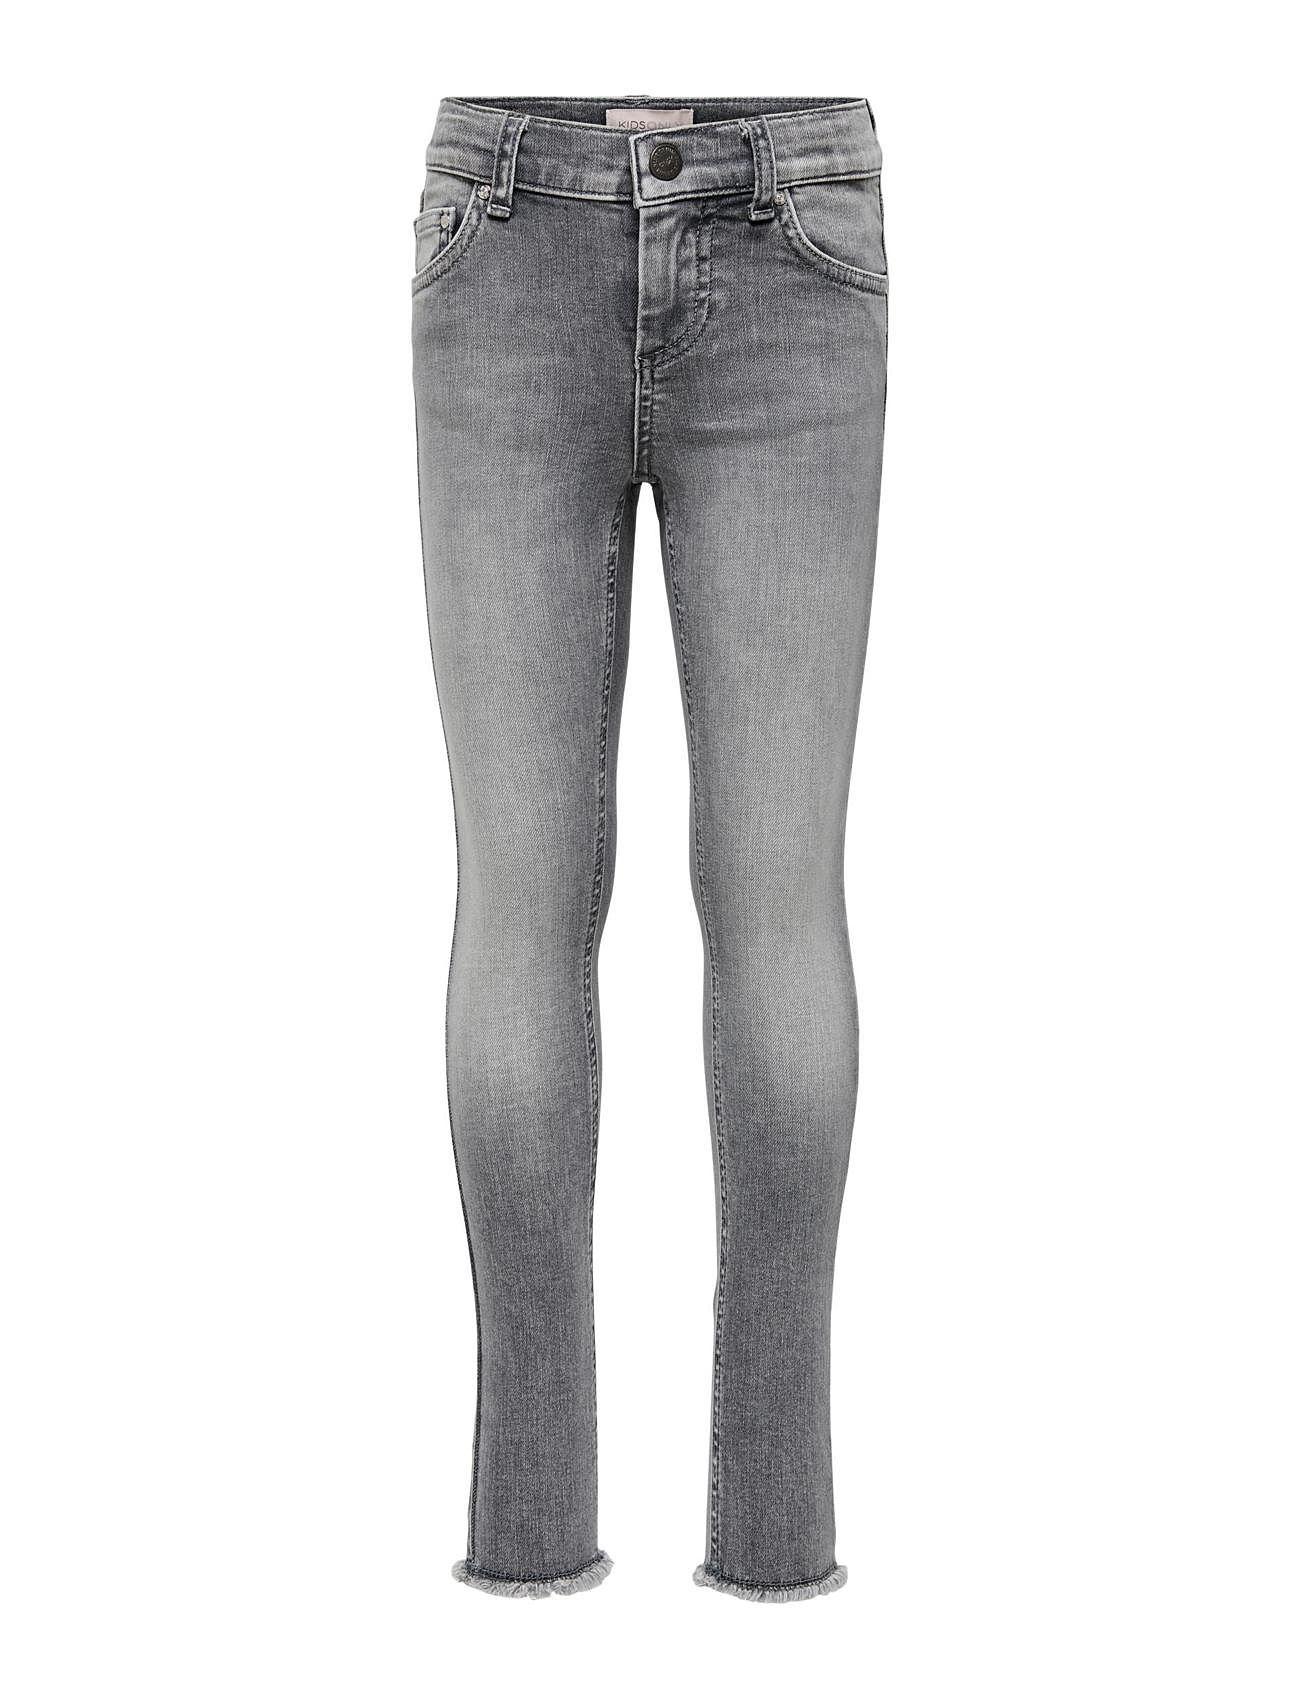 Kids Only Konblush Skinny Raw Jeans 0918 Noos Farkut Harmaa Kids Only